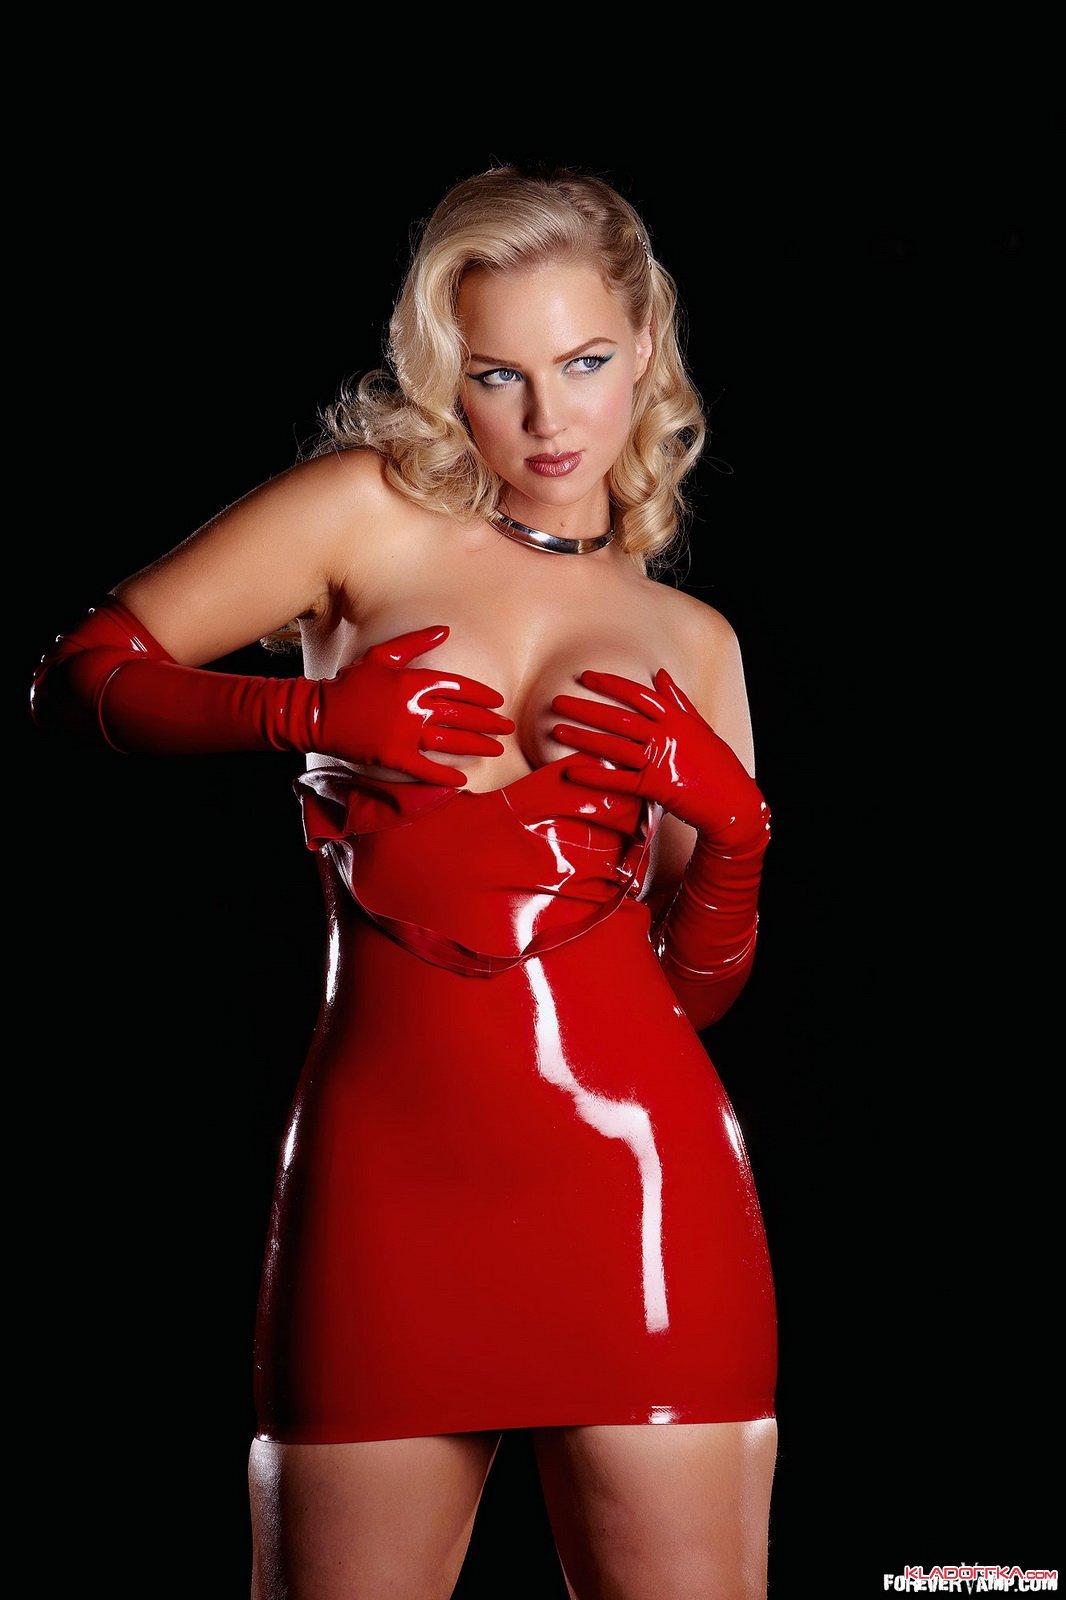 имена порно актрис в красном латексе